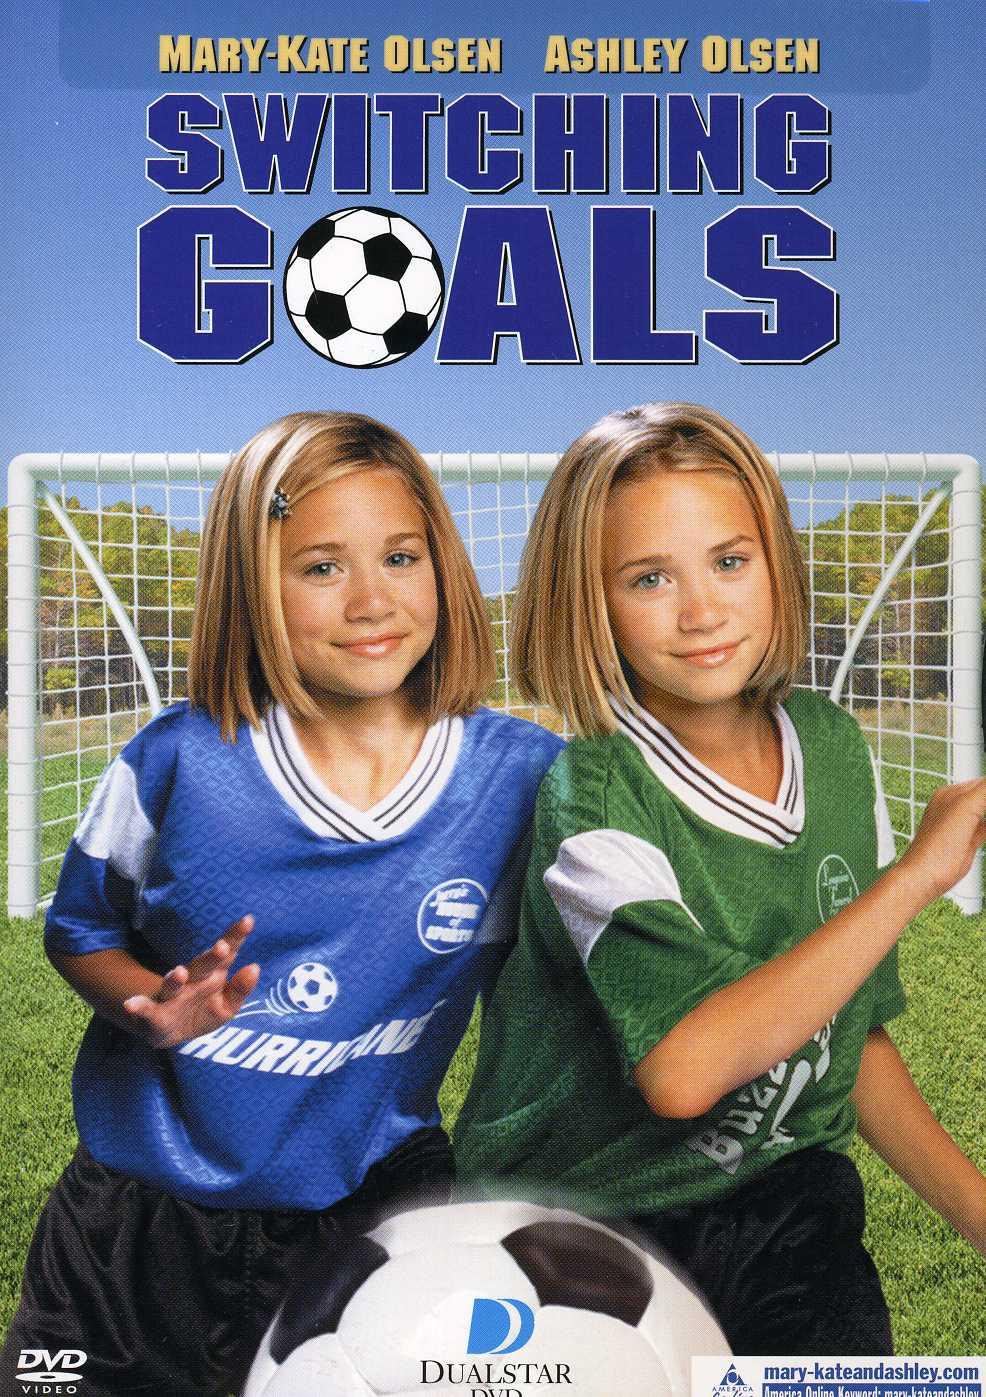 Switching Goals (DVD)